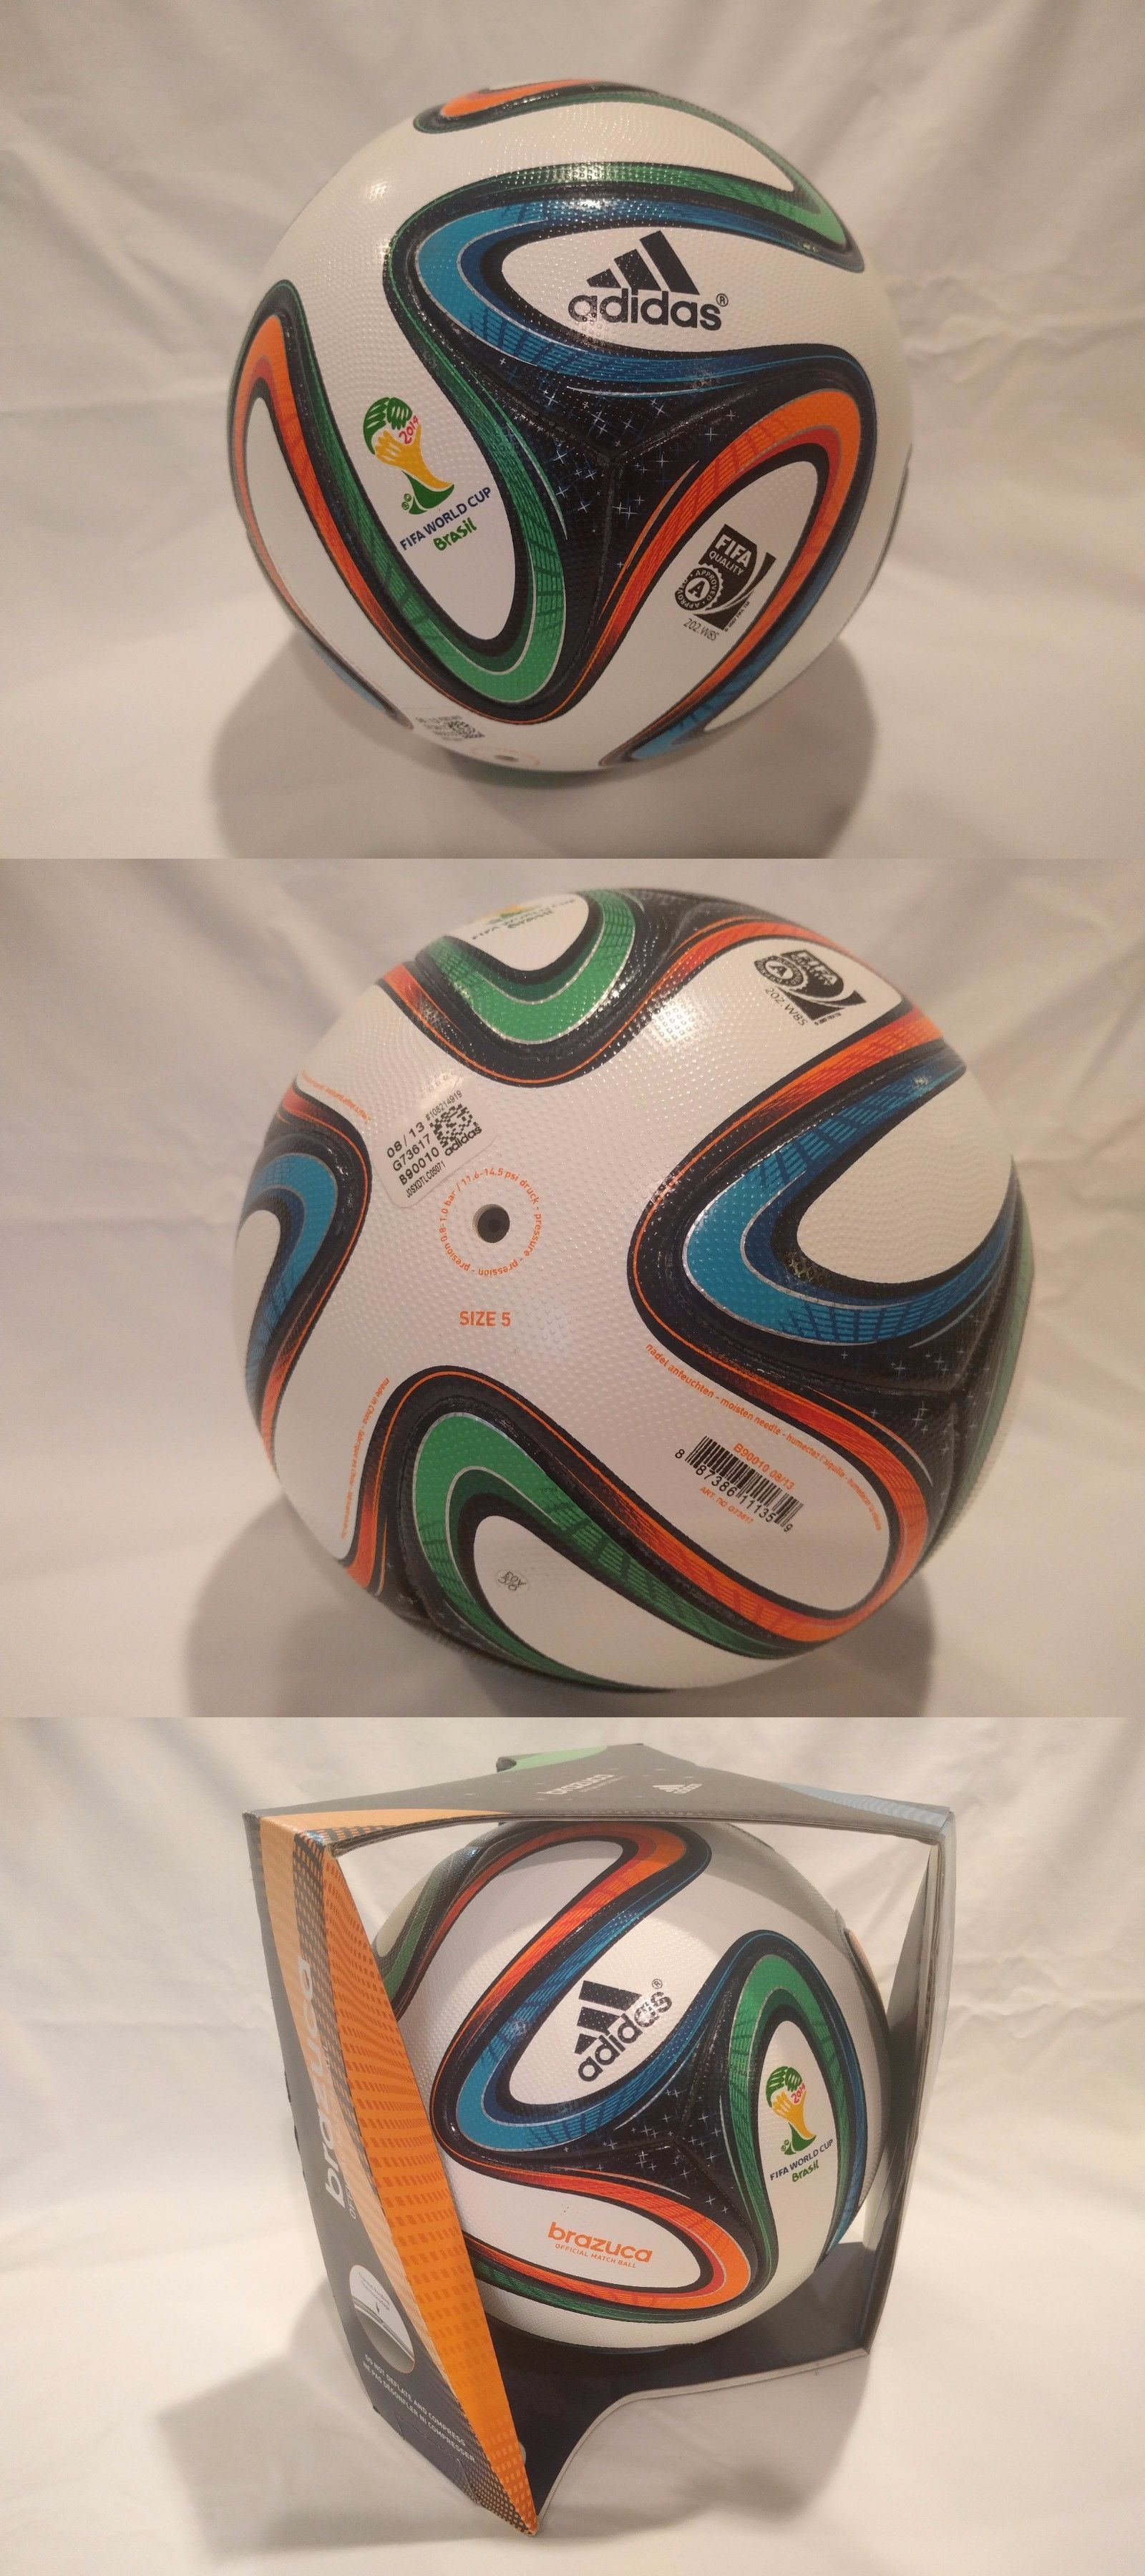 Bolas 20863: World 2014 19996 Adidas Brazuca Copa del 20863: partido oficial Fifa World Cup 4d03f24 - immunitetfolie.website